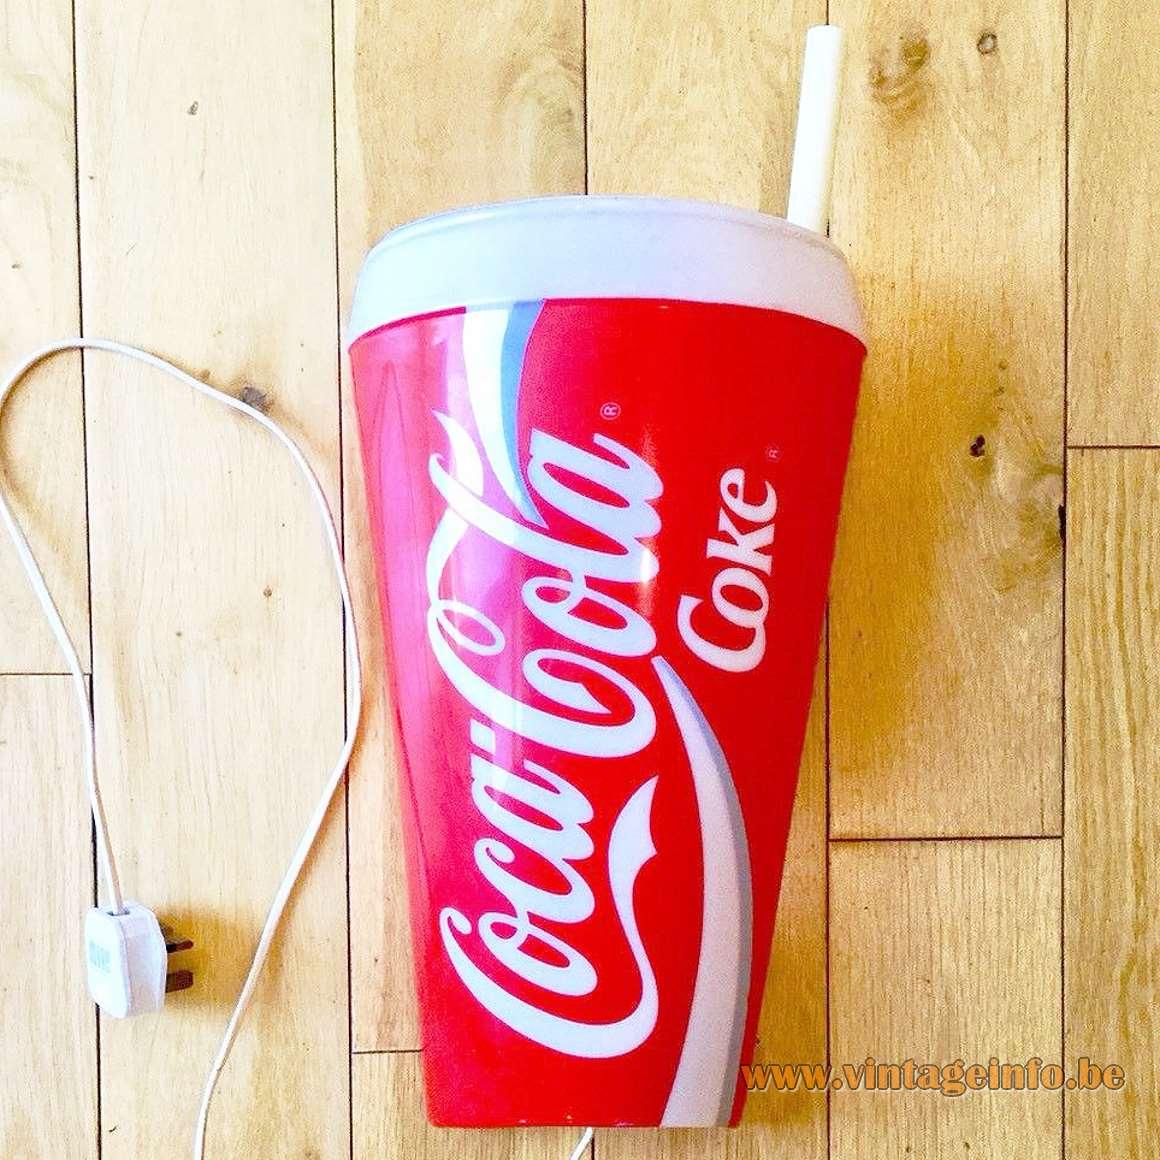 Vintage Coke Coca-Cola wall lamp light advertising sign 1980s Brainstorm France E14 socket